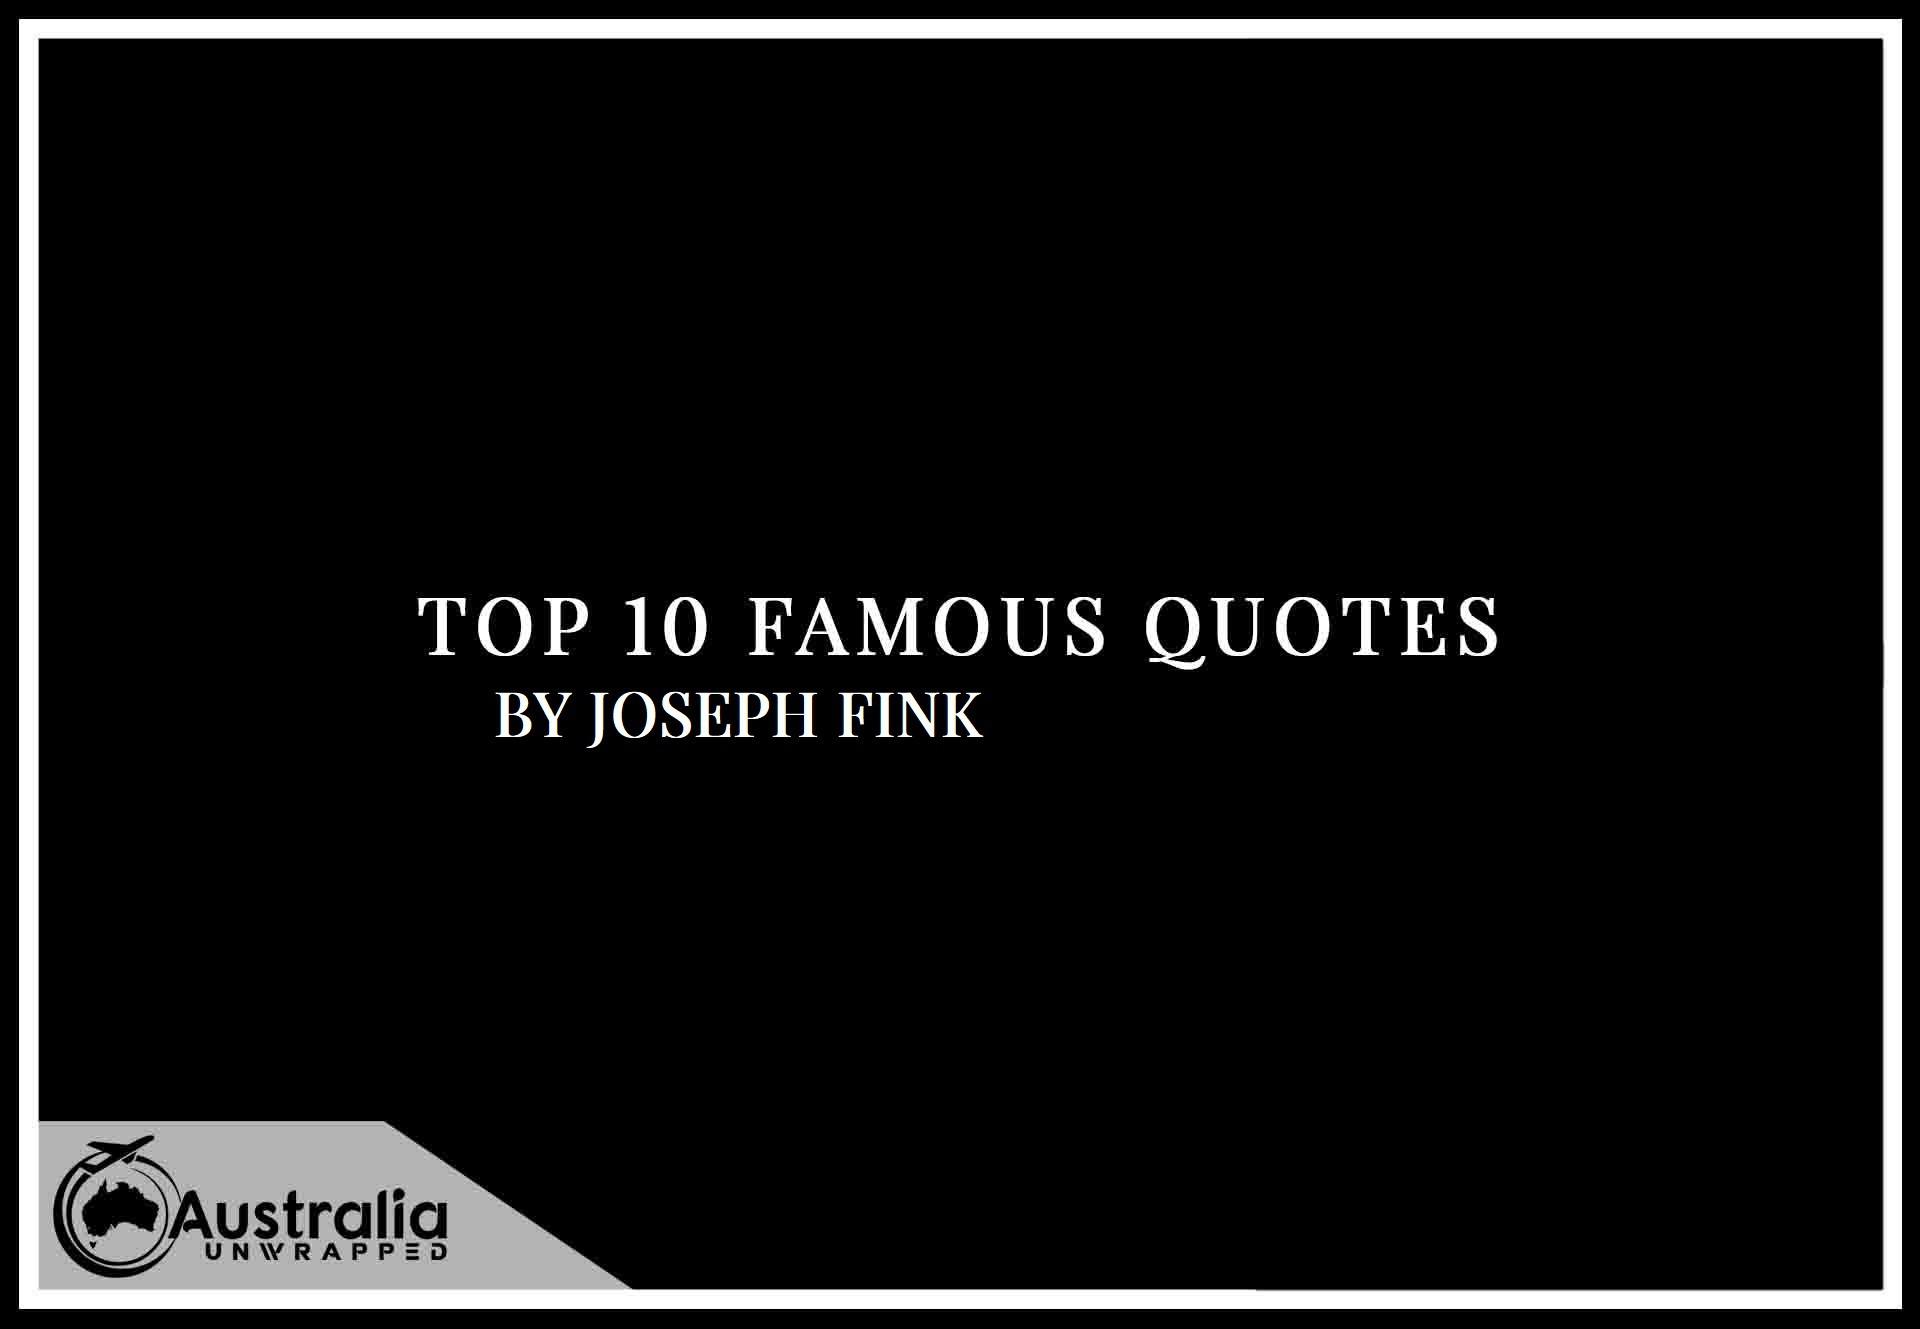 Top 10 Famous Quotes by Author Joseph Fink